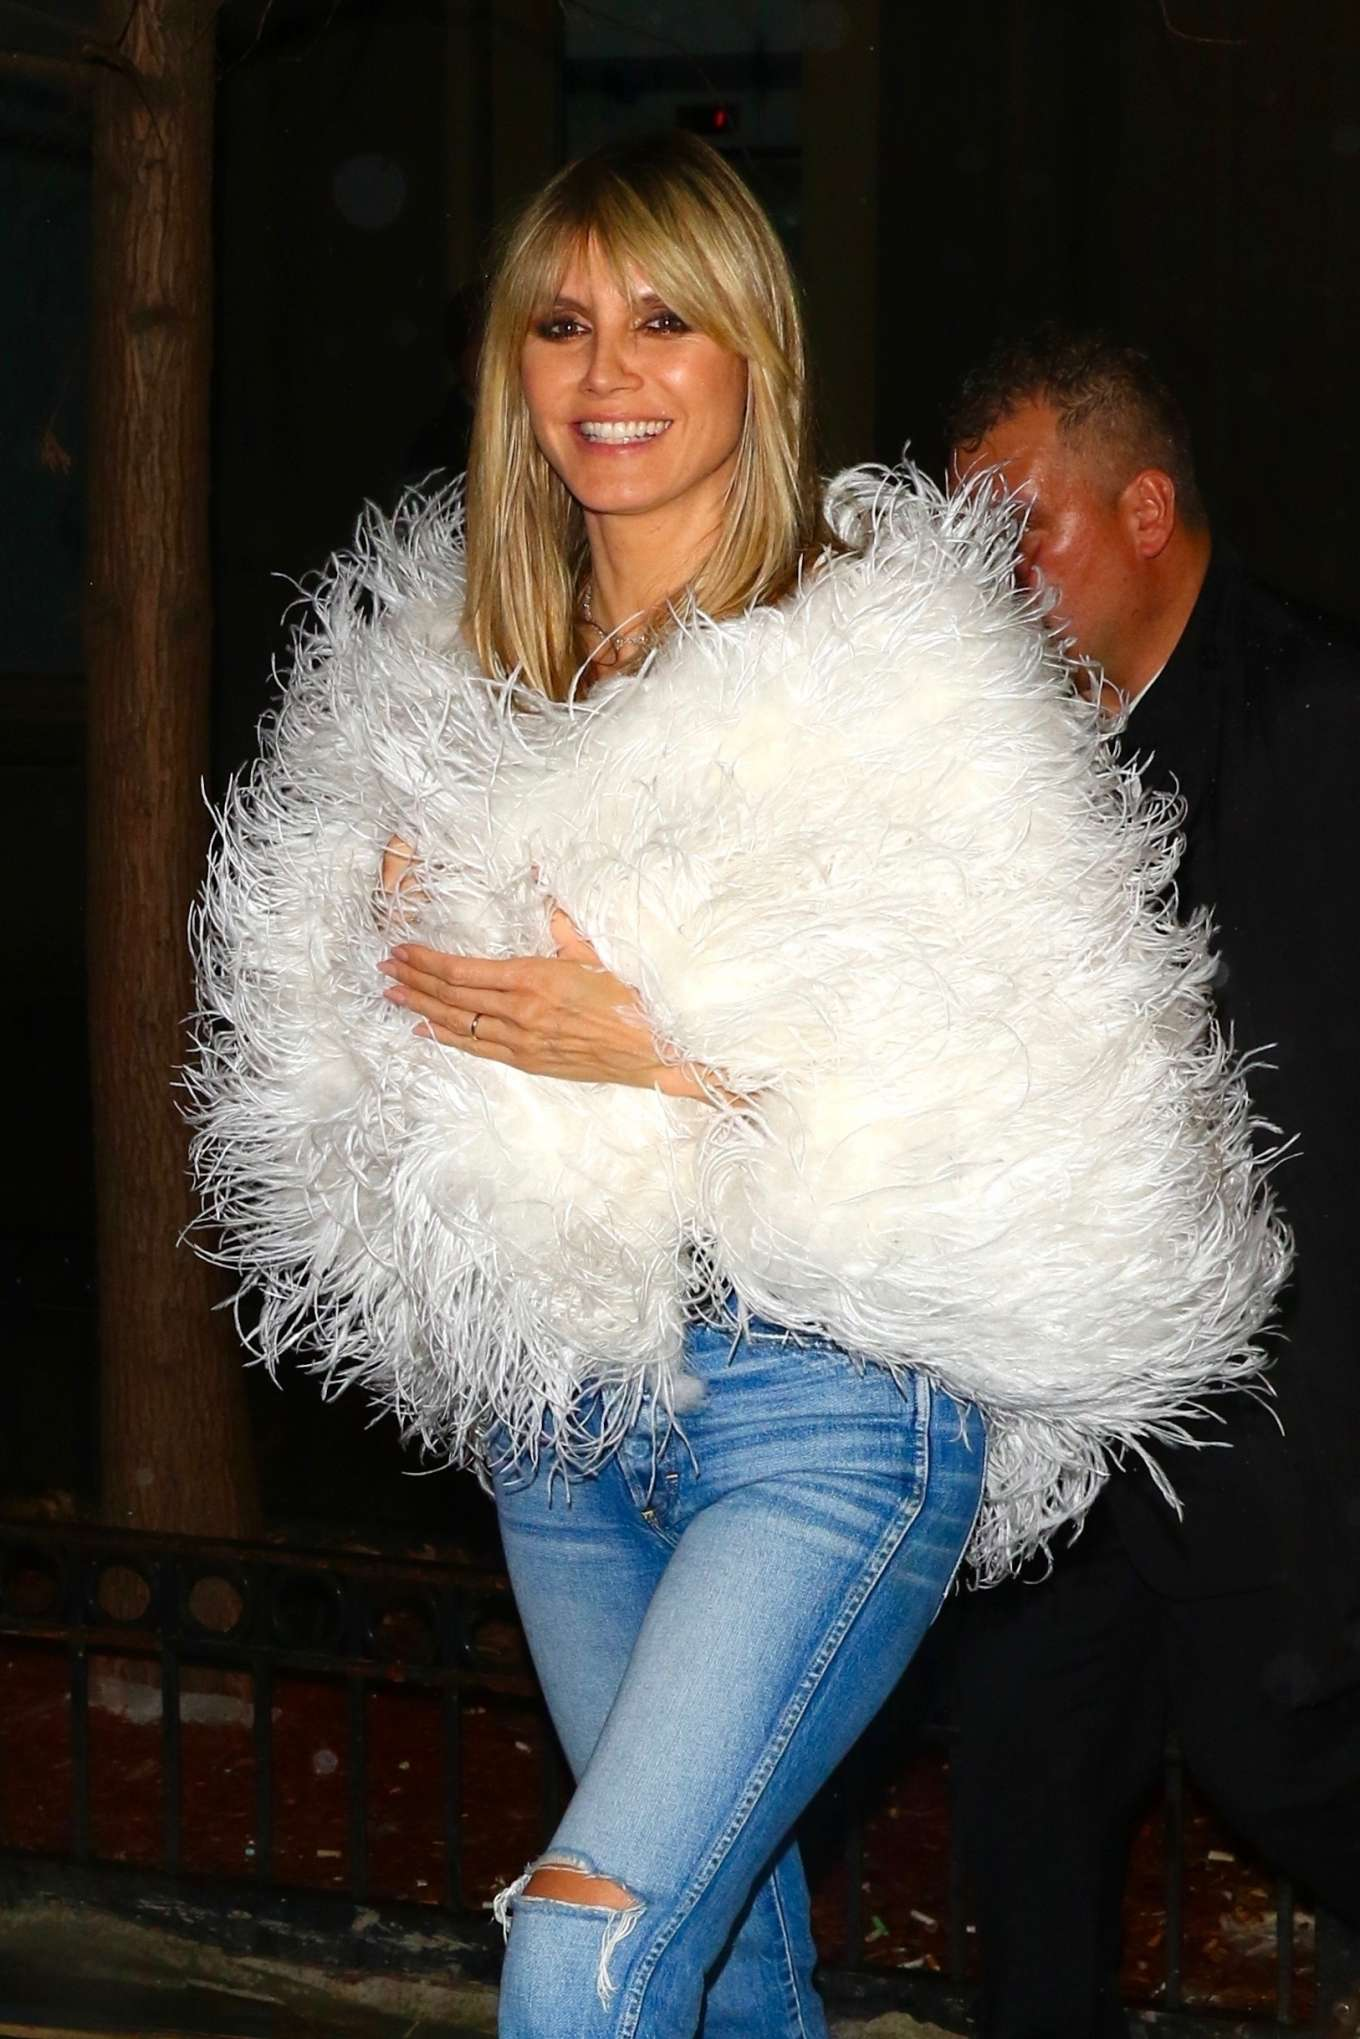 Heidi Klum 2020 : Heidi Klum – Heads to a party after the amfAR Gala in New York-10